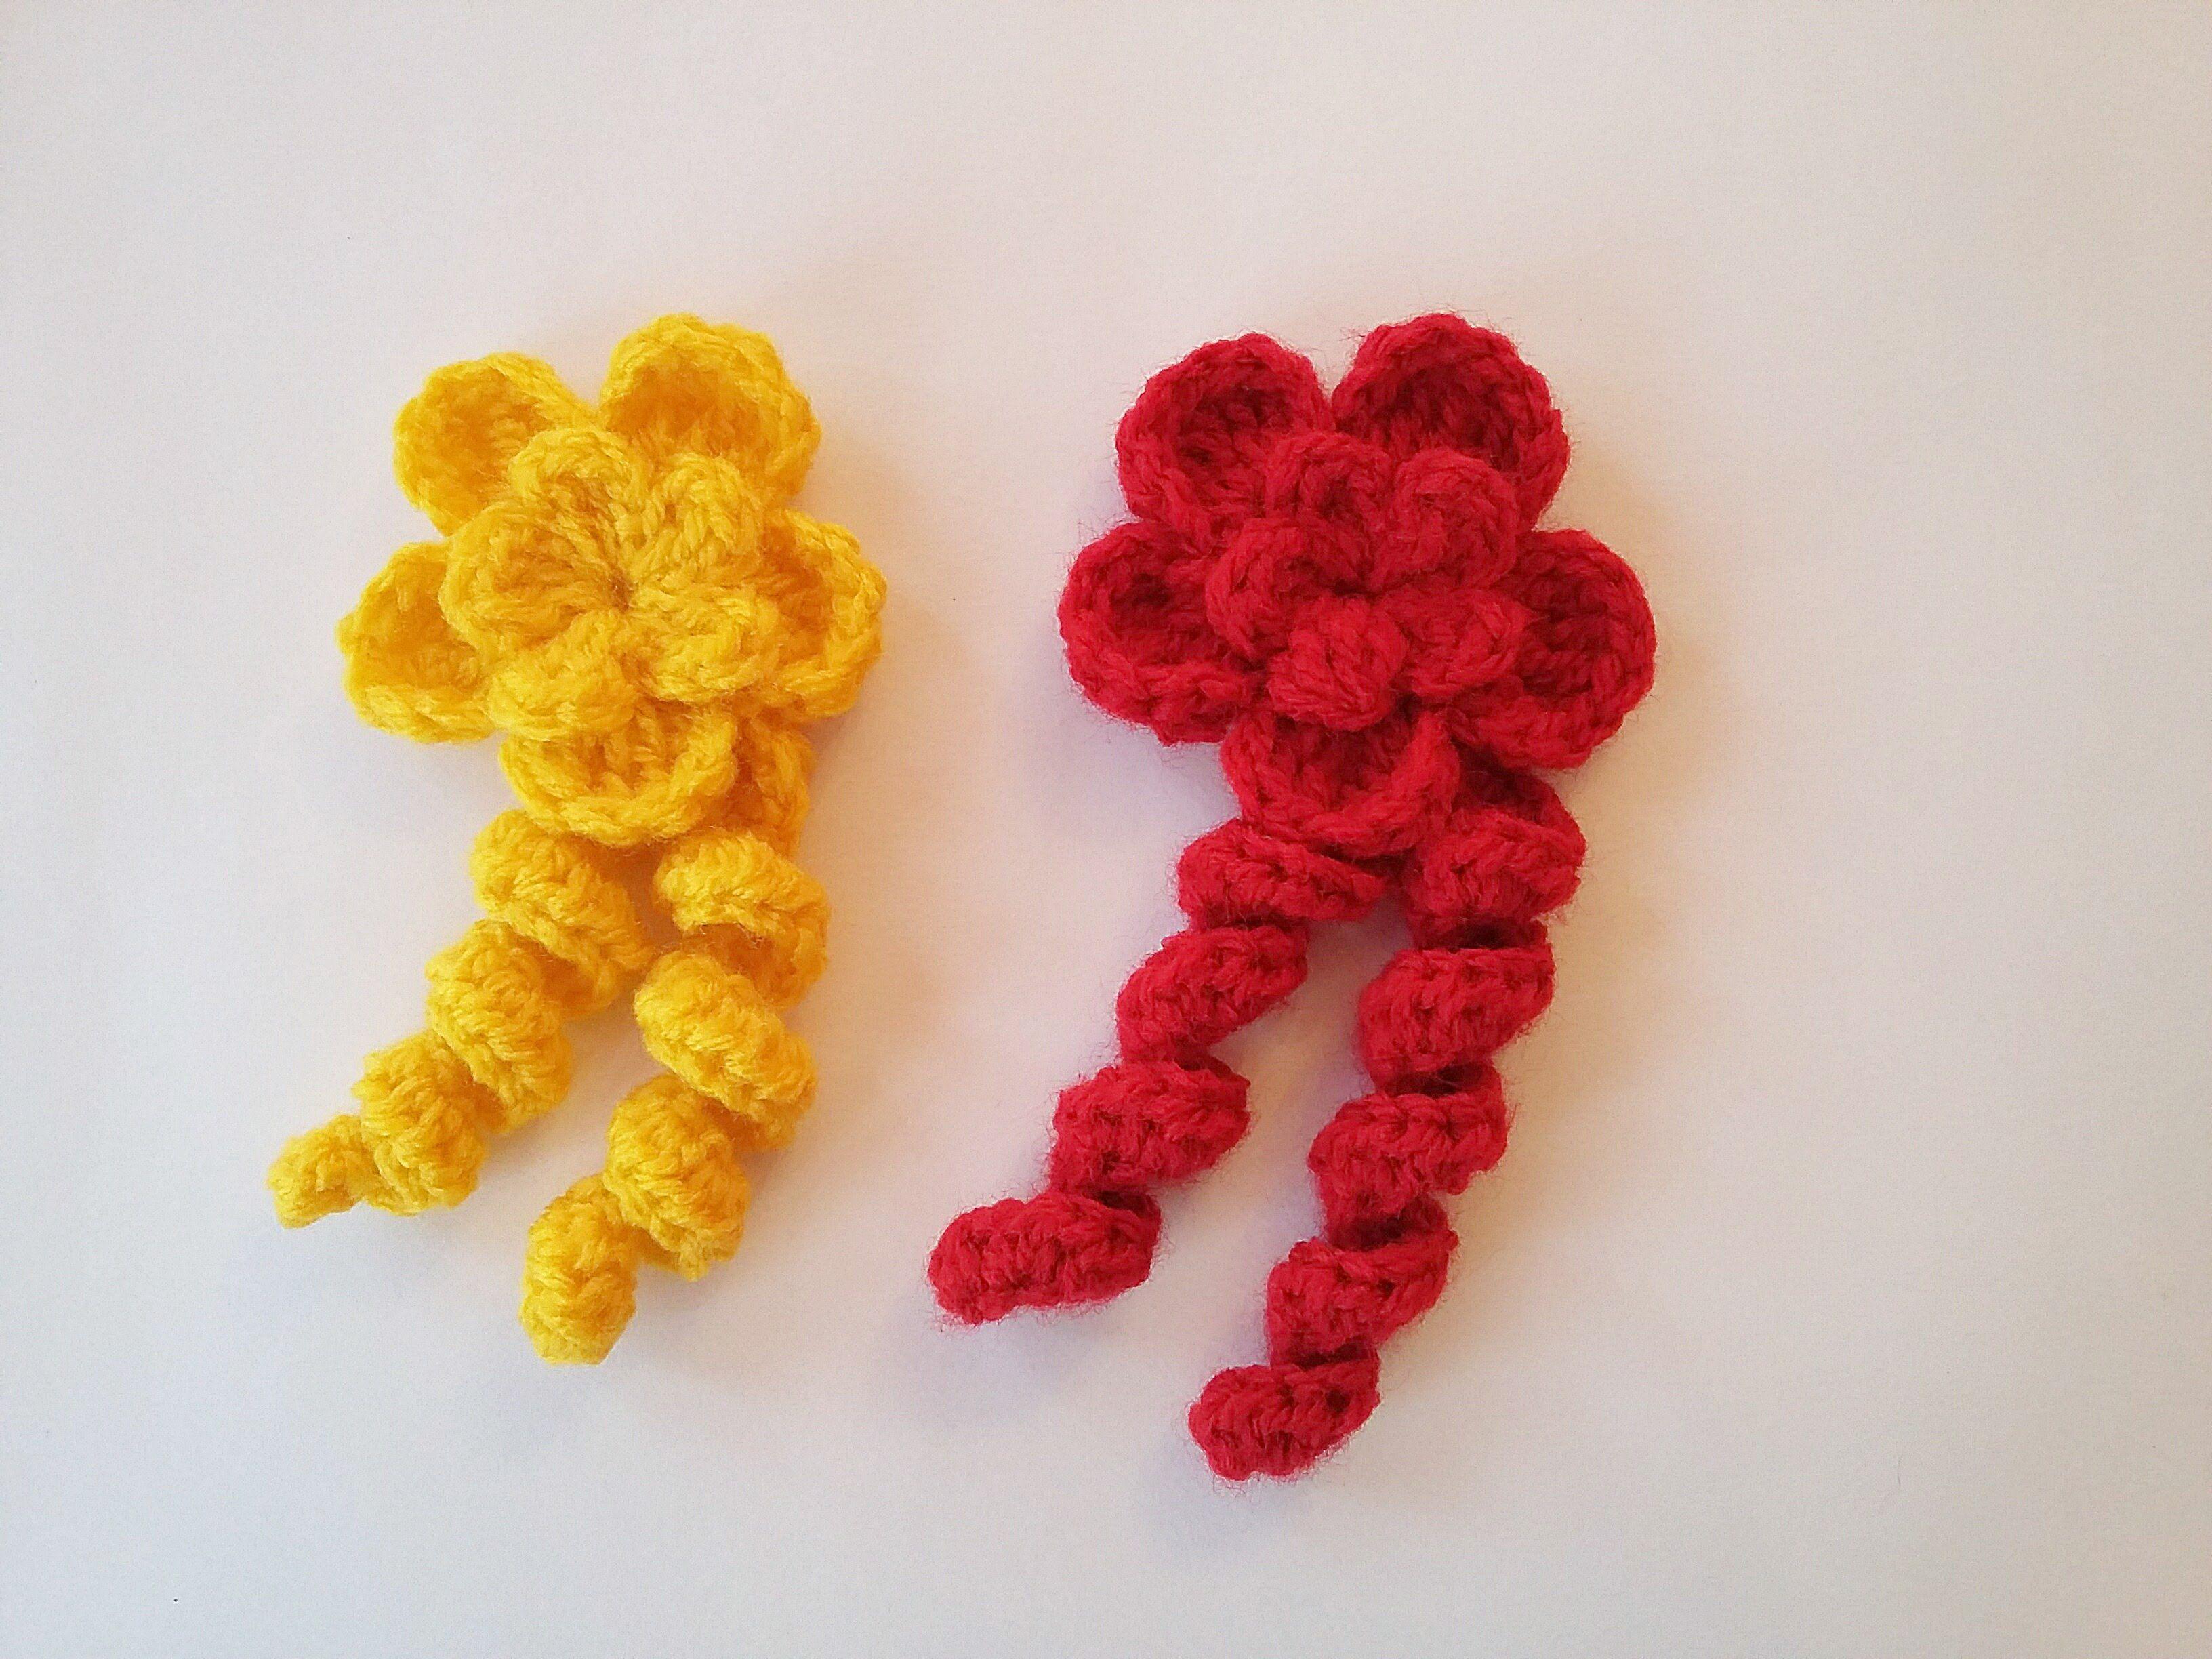 Crochet flowers - Fantasy